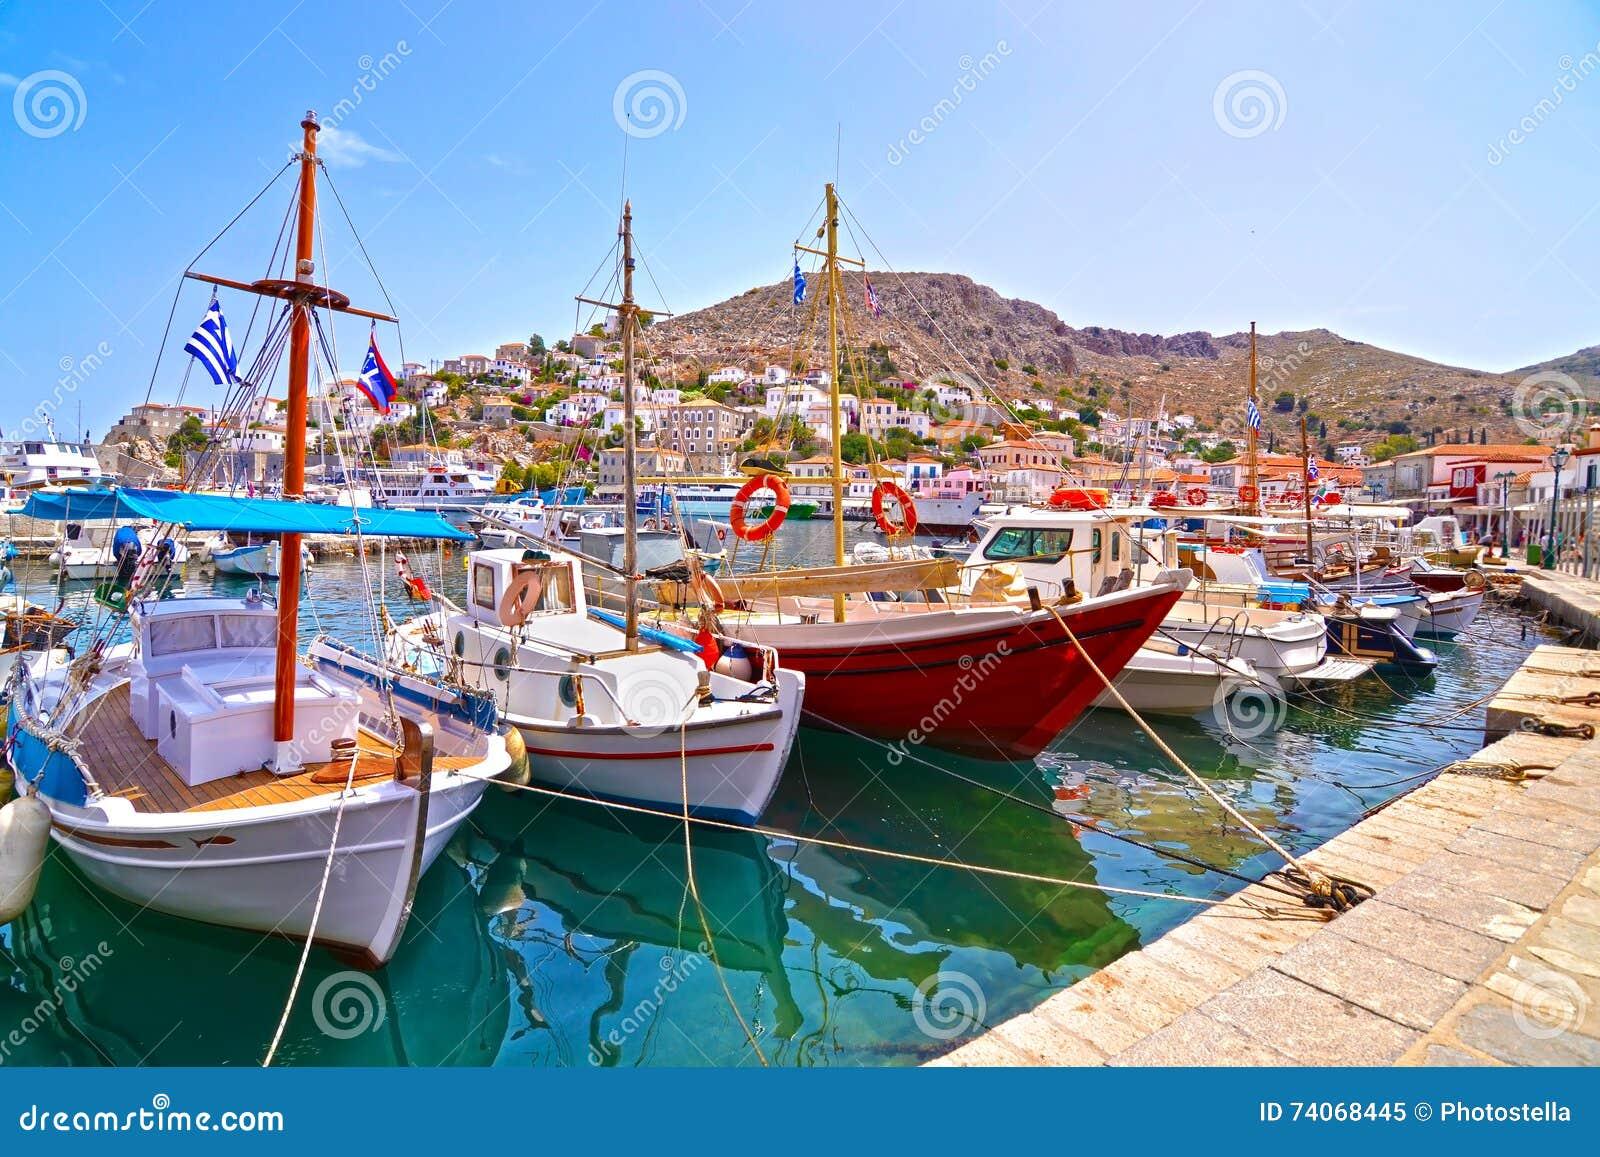 Boats at Hydra island Greece